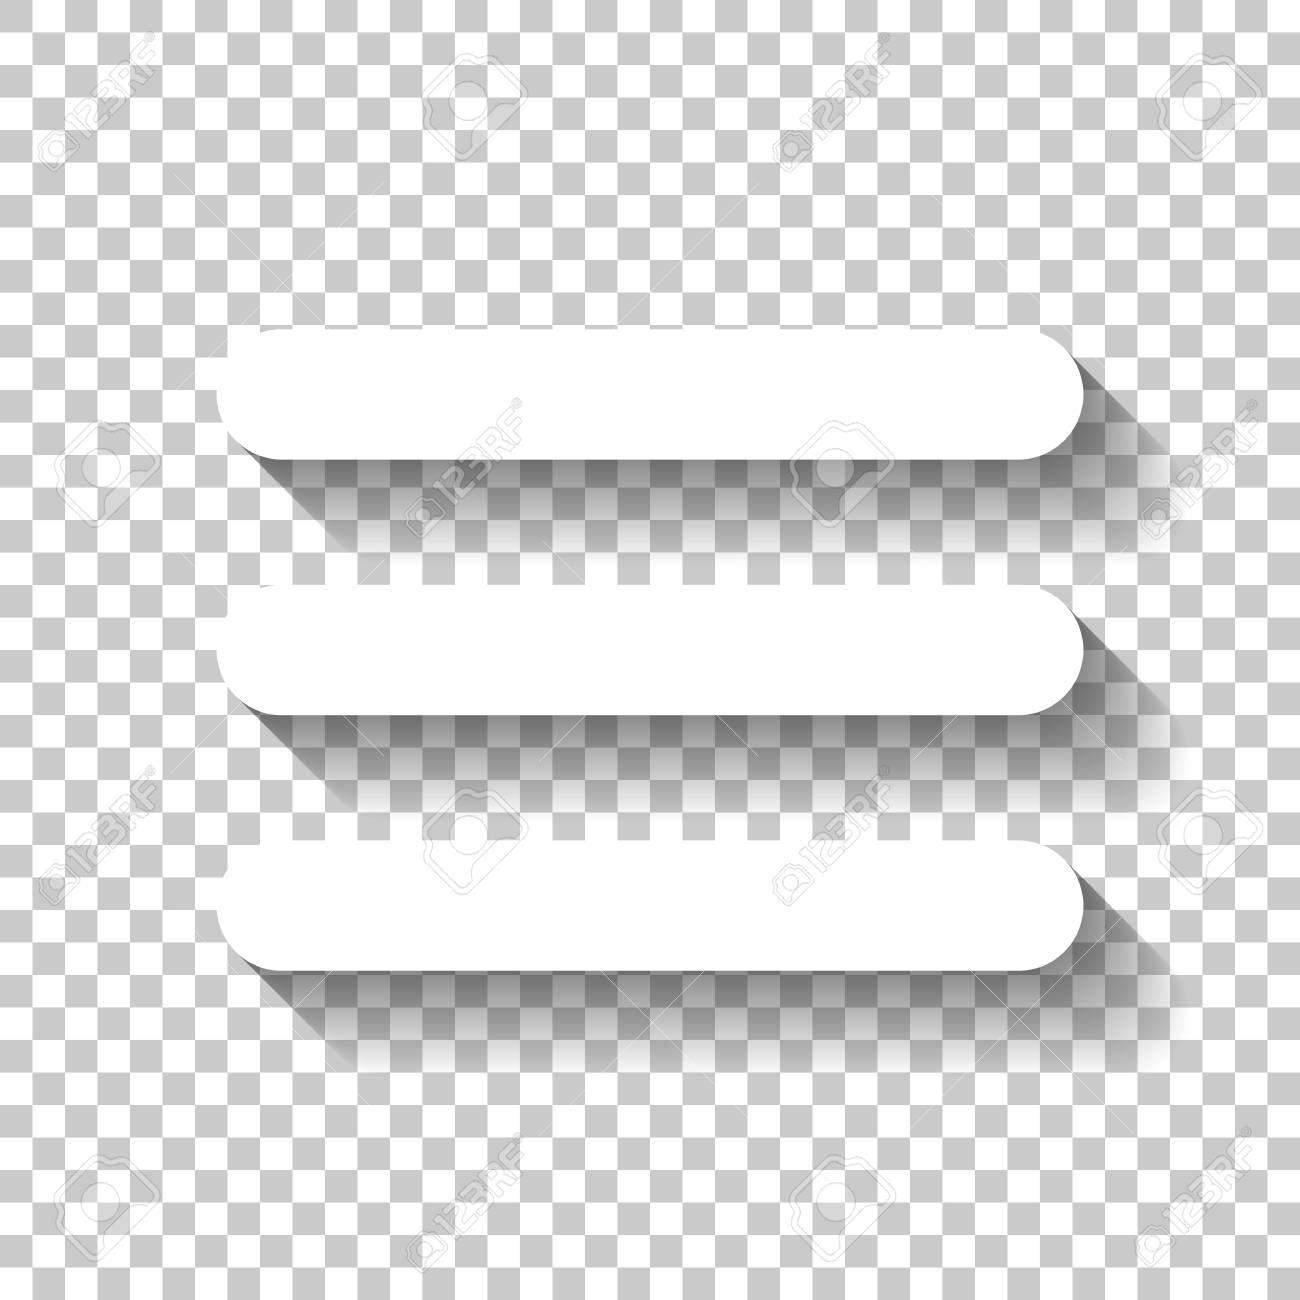 Hamburger menu. Web icon. White icon with shadow on transparent background - 108564673